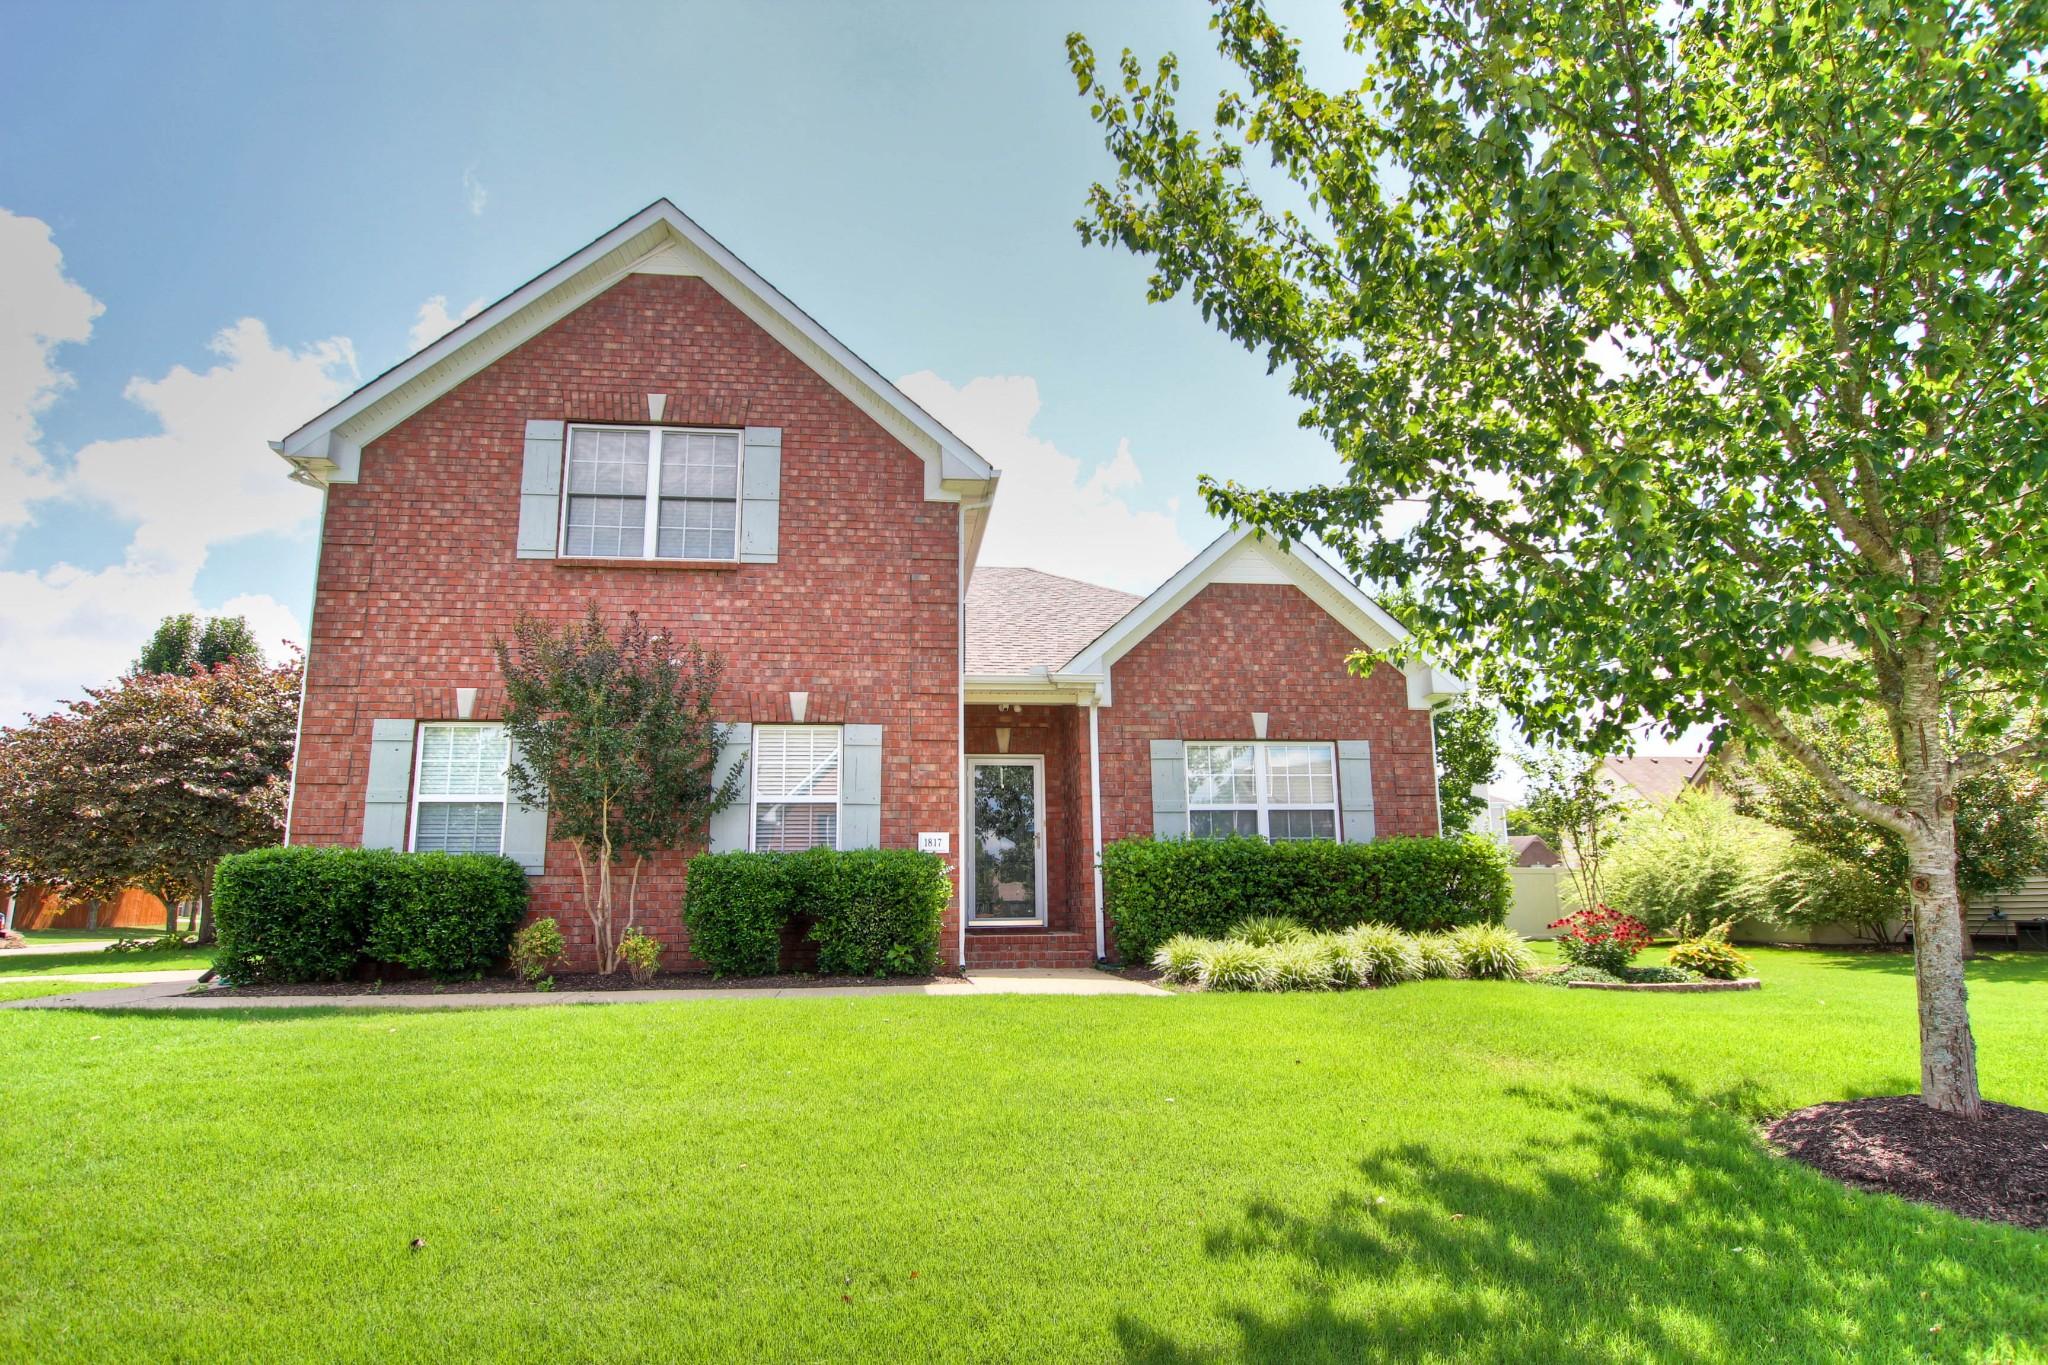 1817 Kinsale Ave Property Photo - Murfreesboro, TN real estate listing